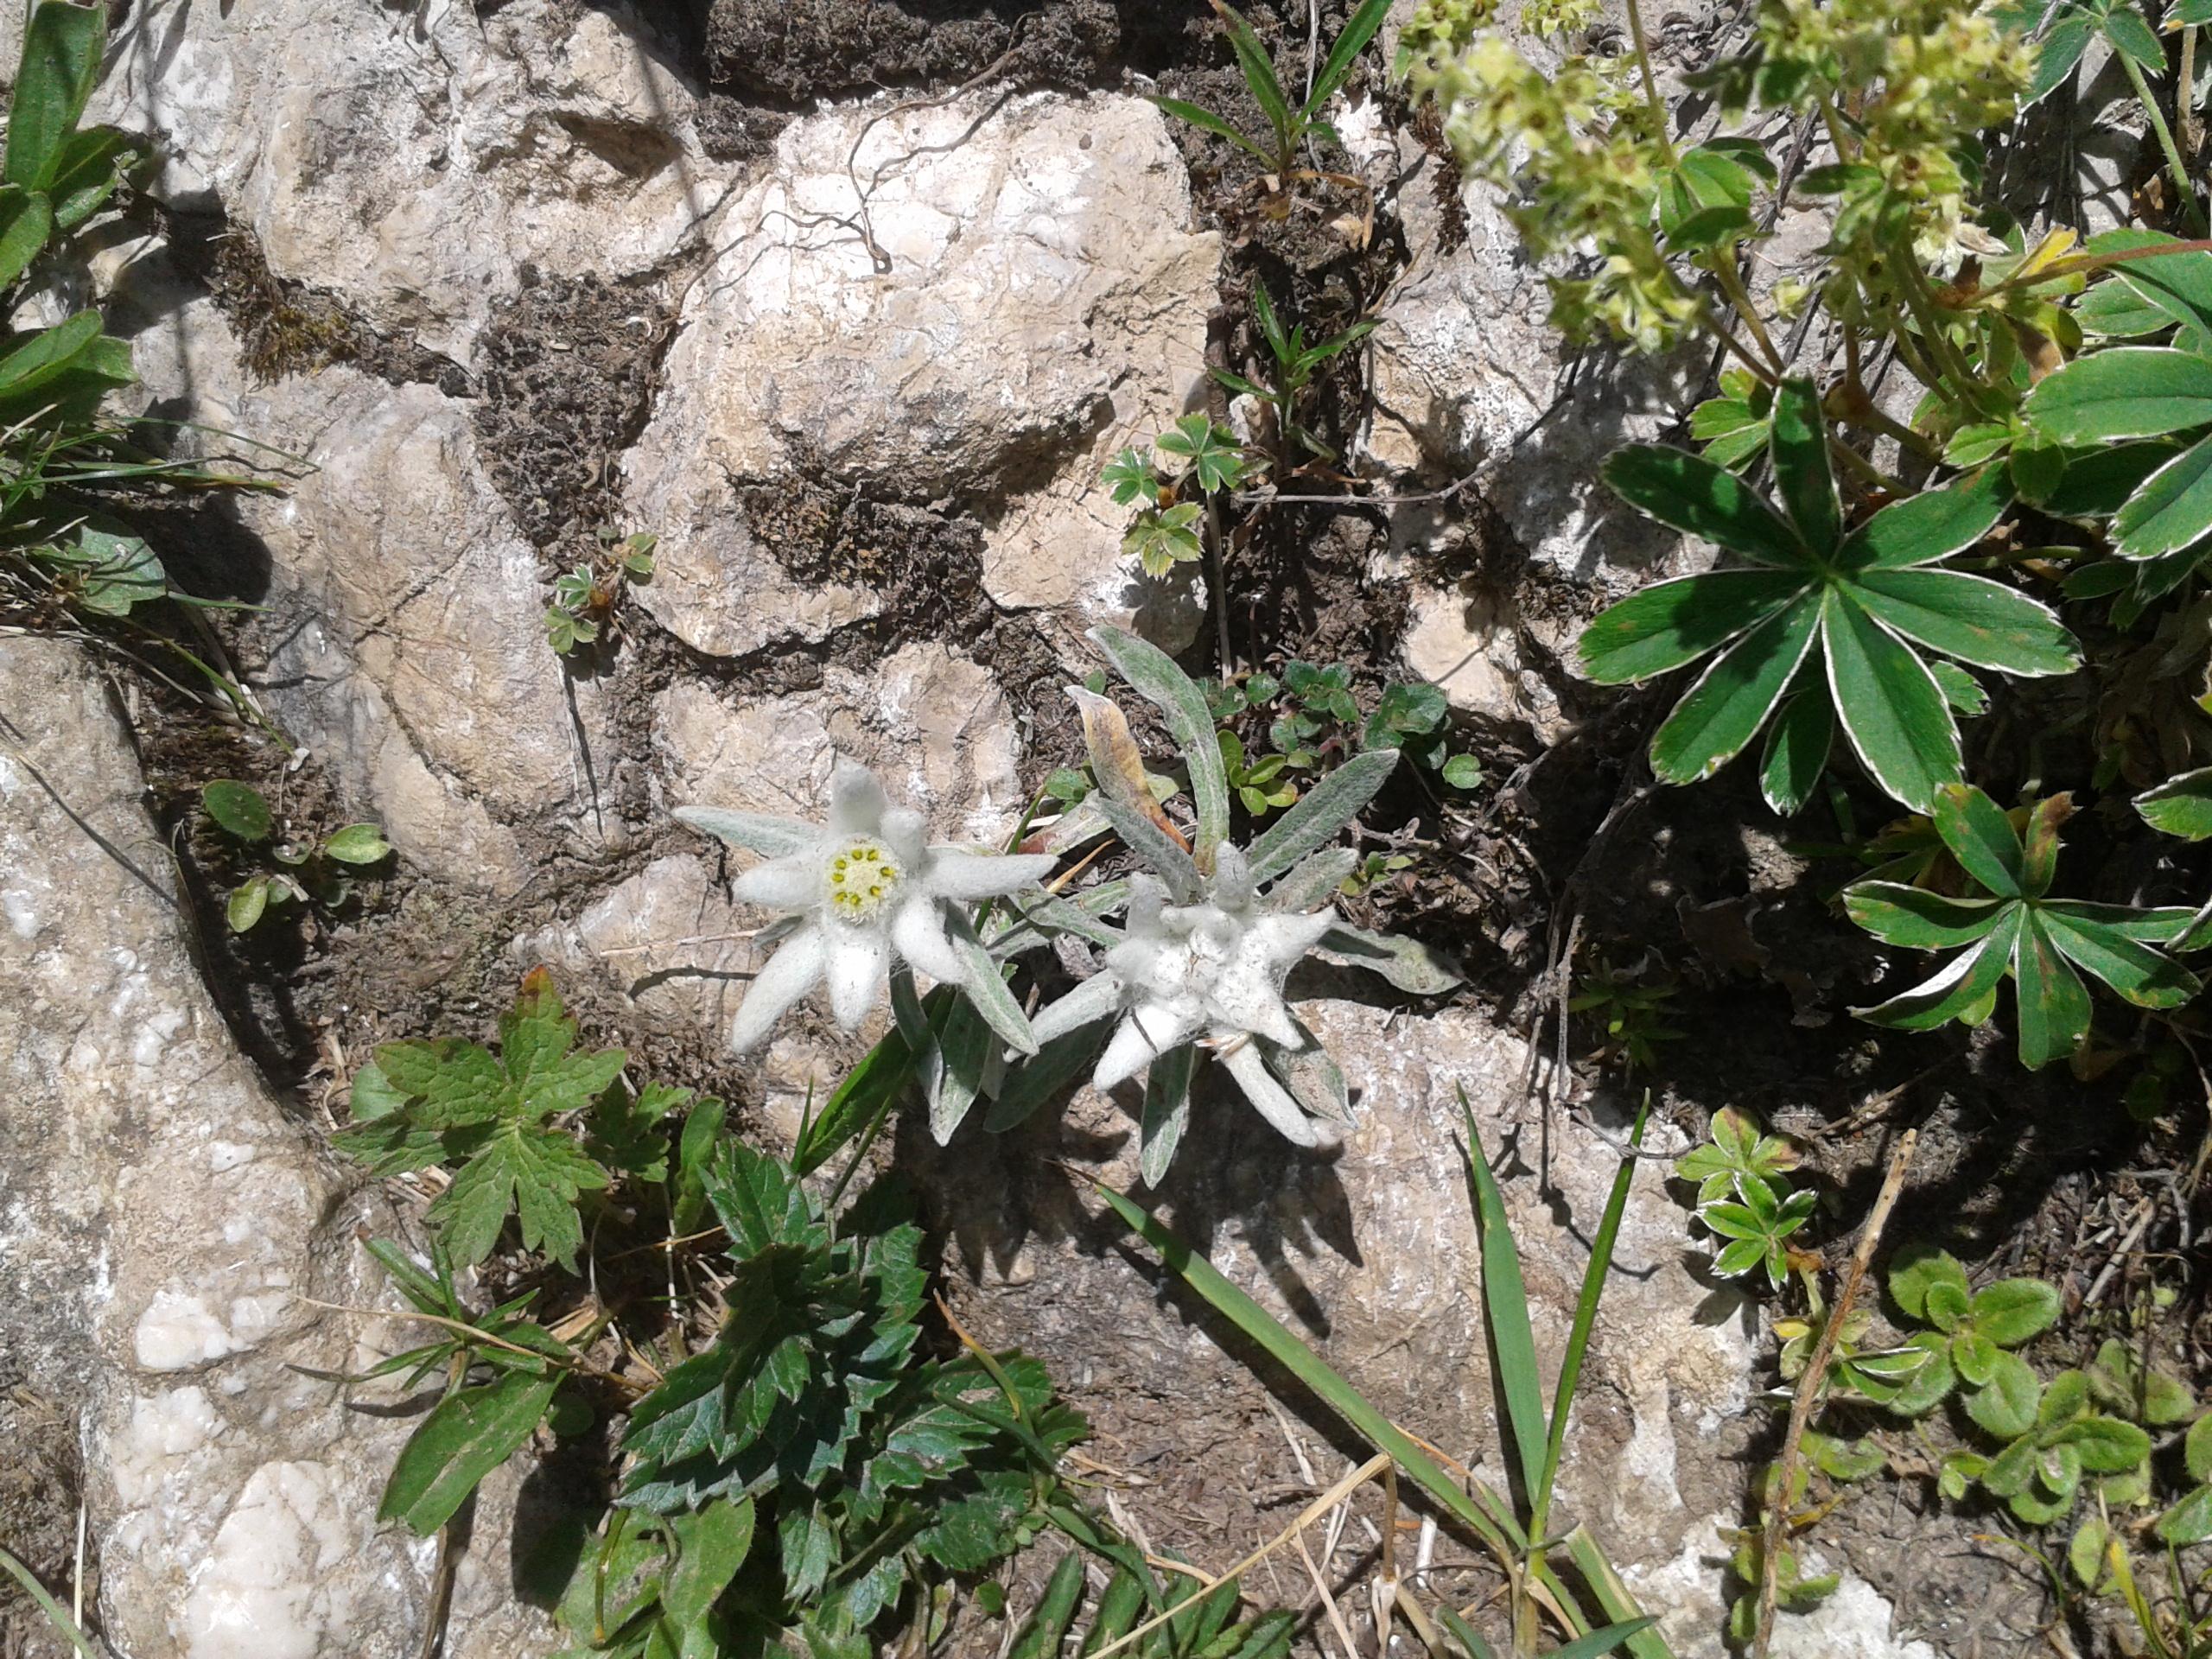 Edelweiss - Bergwanderung Prien a.Ch